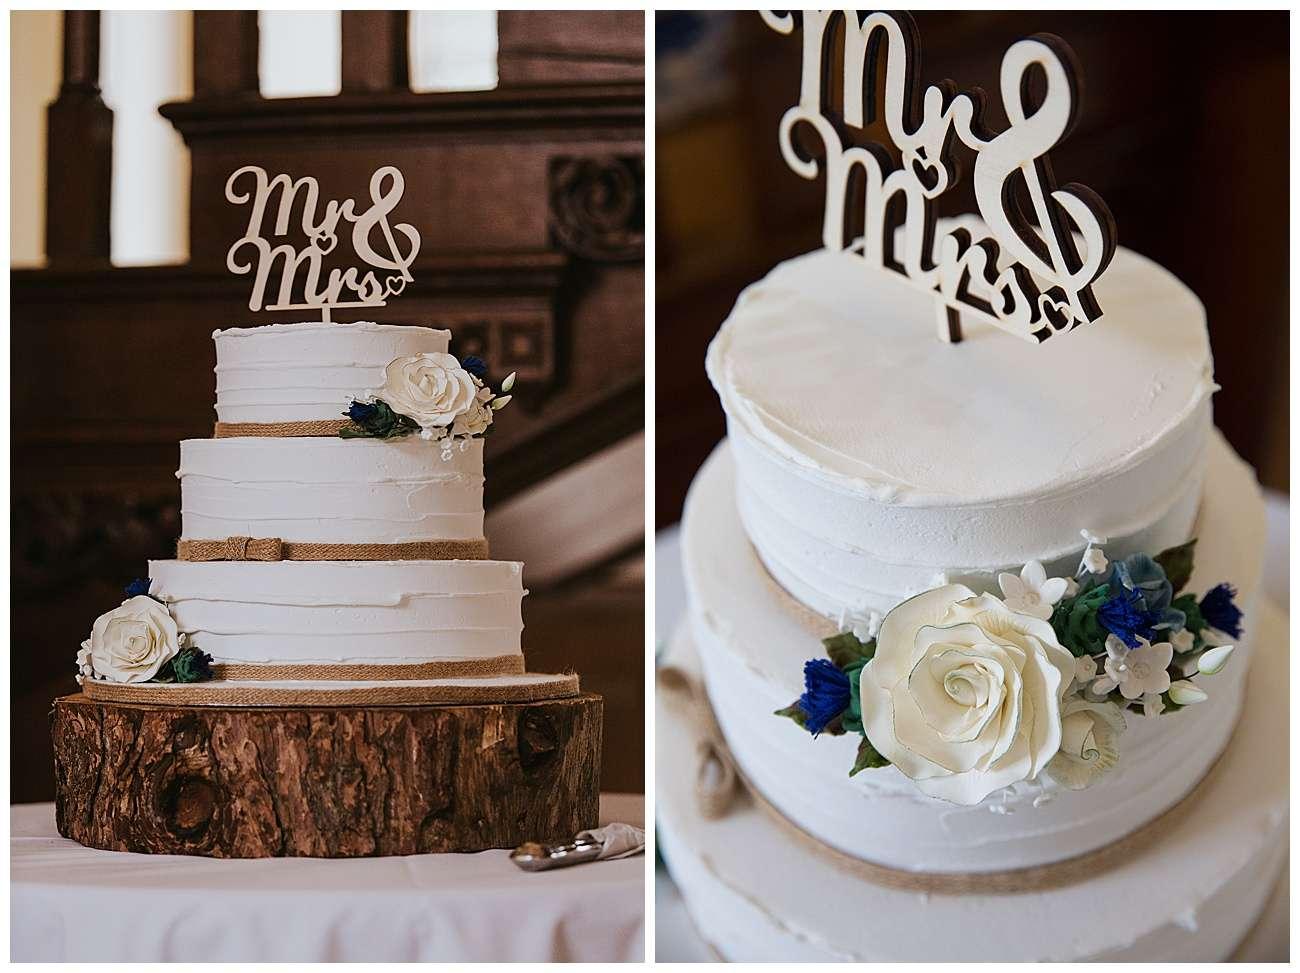 The wedding cake detail shots